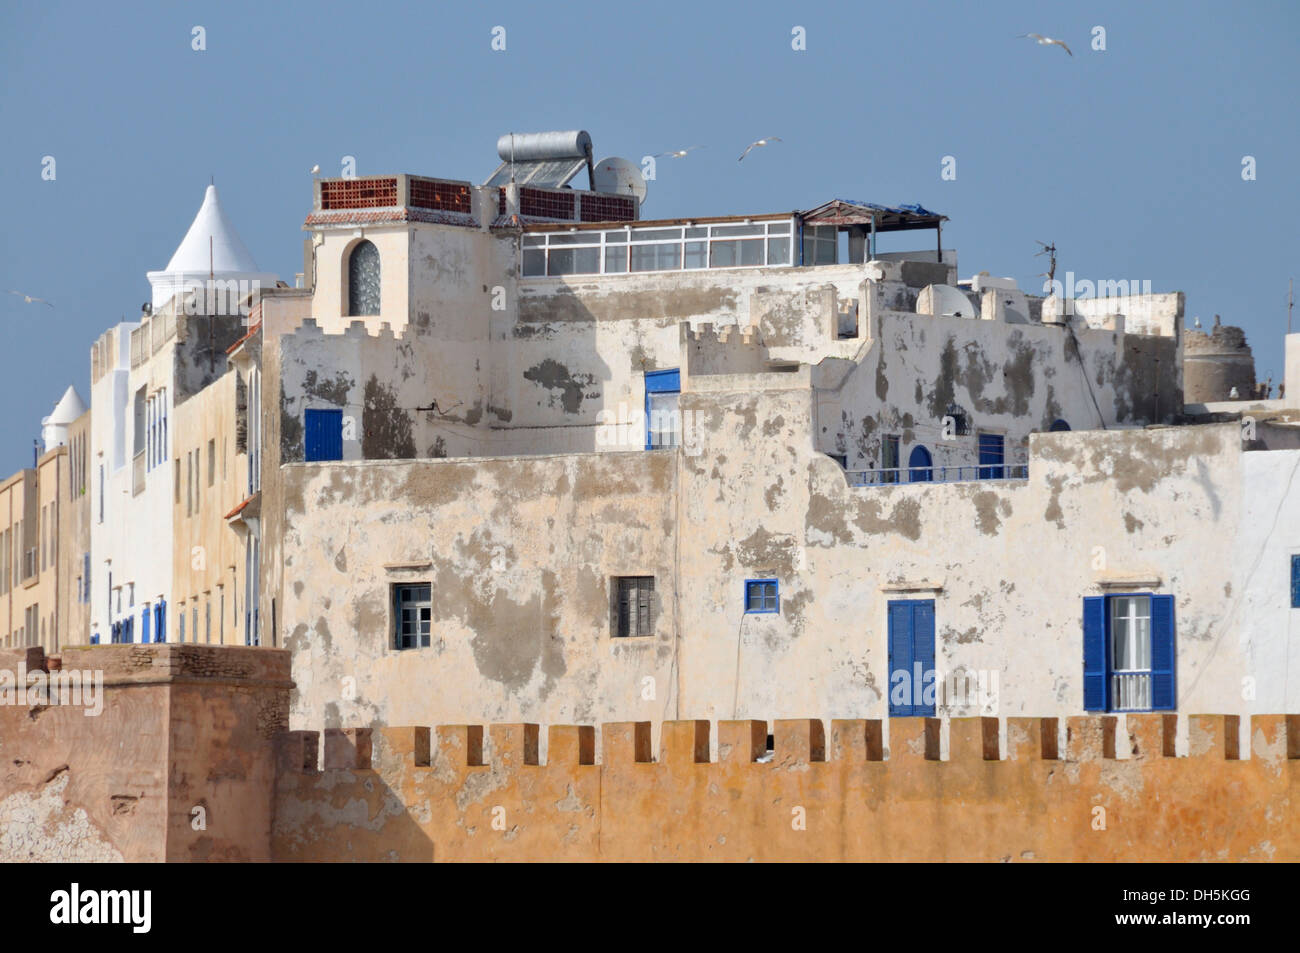 Sqala de la Kasbah, fortifications of the historic town of Essaouria, Mogador, Unesco World Heritatge Site, Morocco, Africa Stock Photo